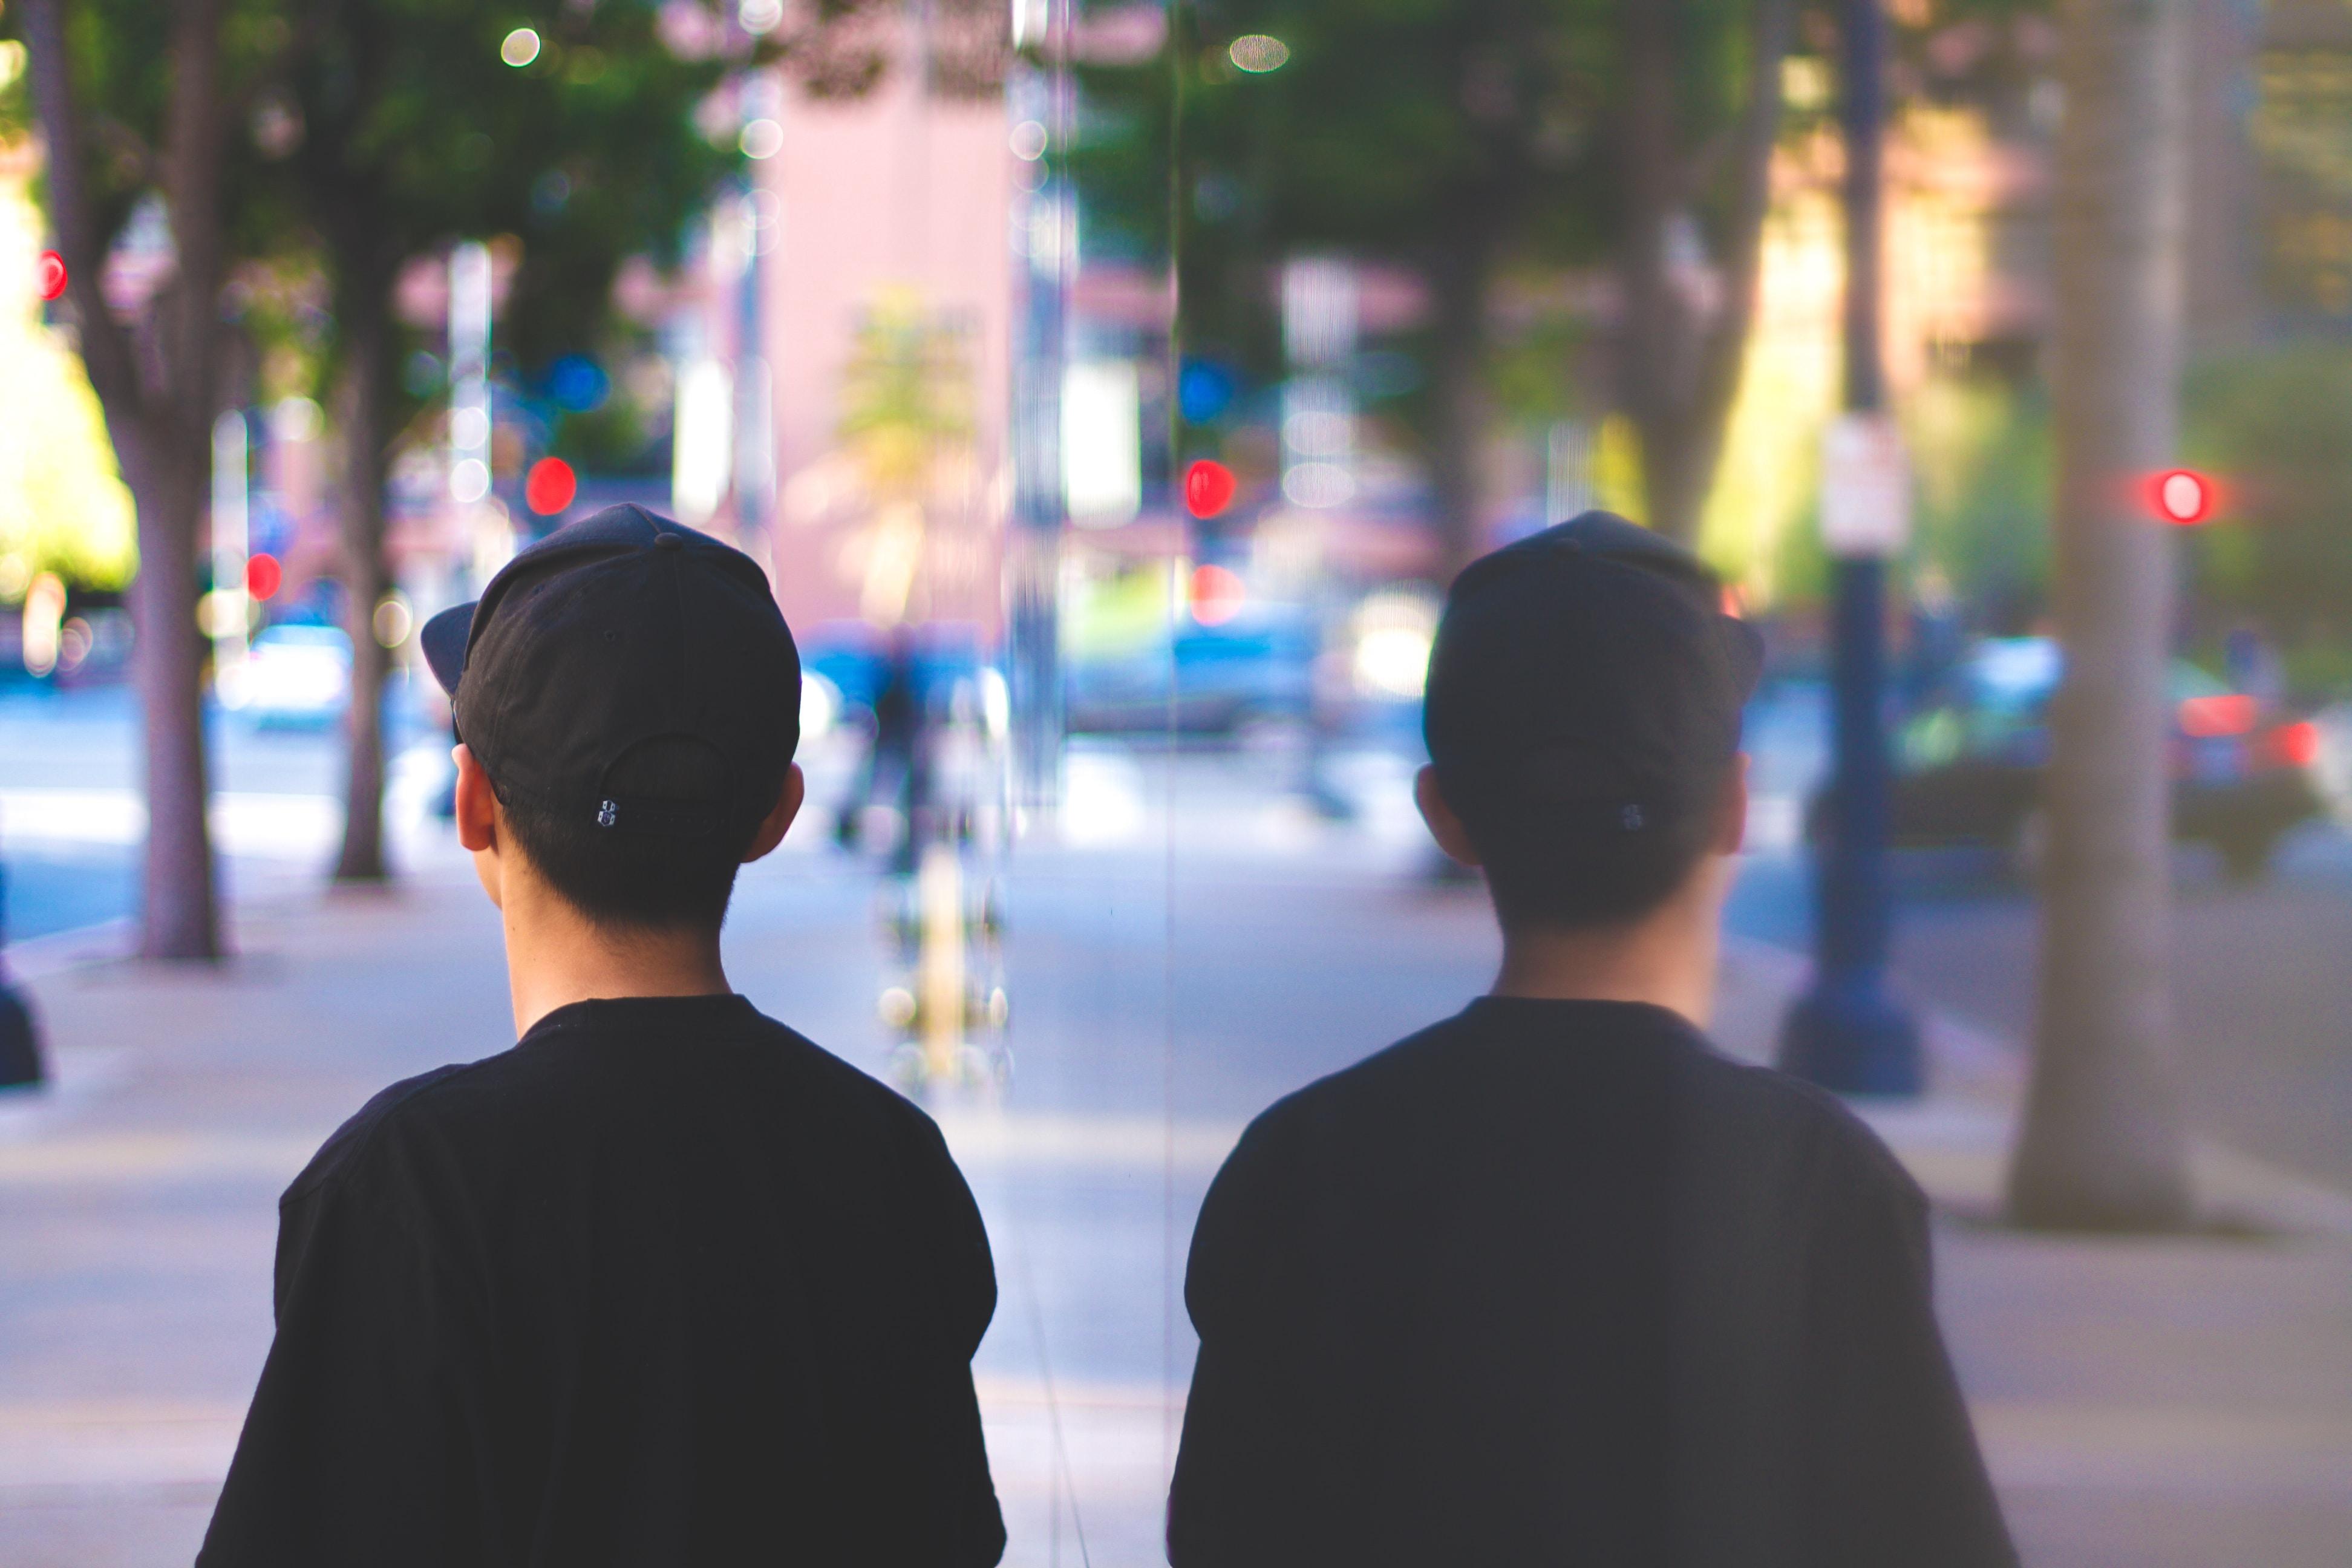 A reflection of a boy wearing a baseball cap standing on a sidewalk